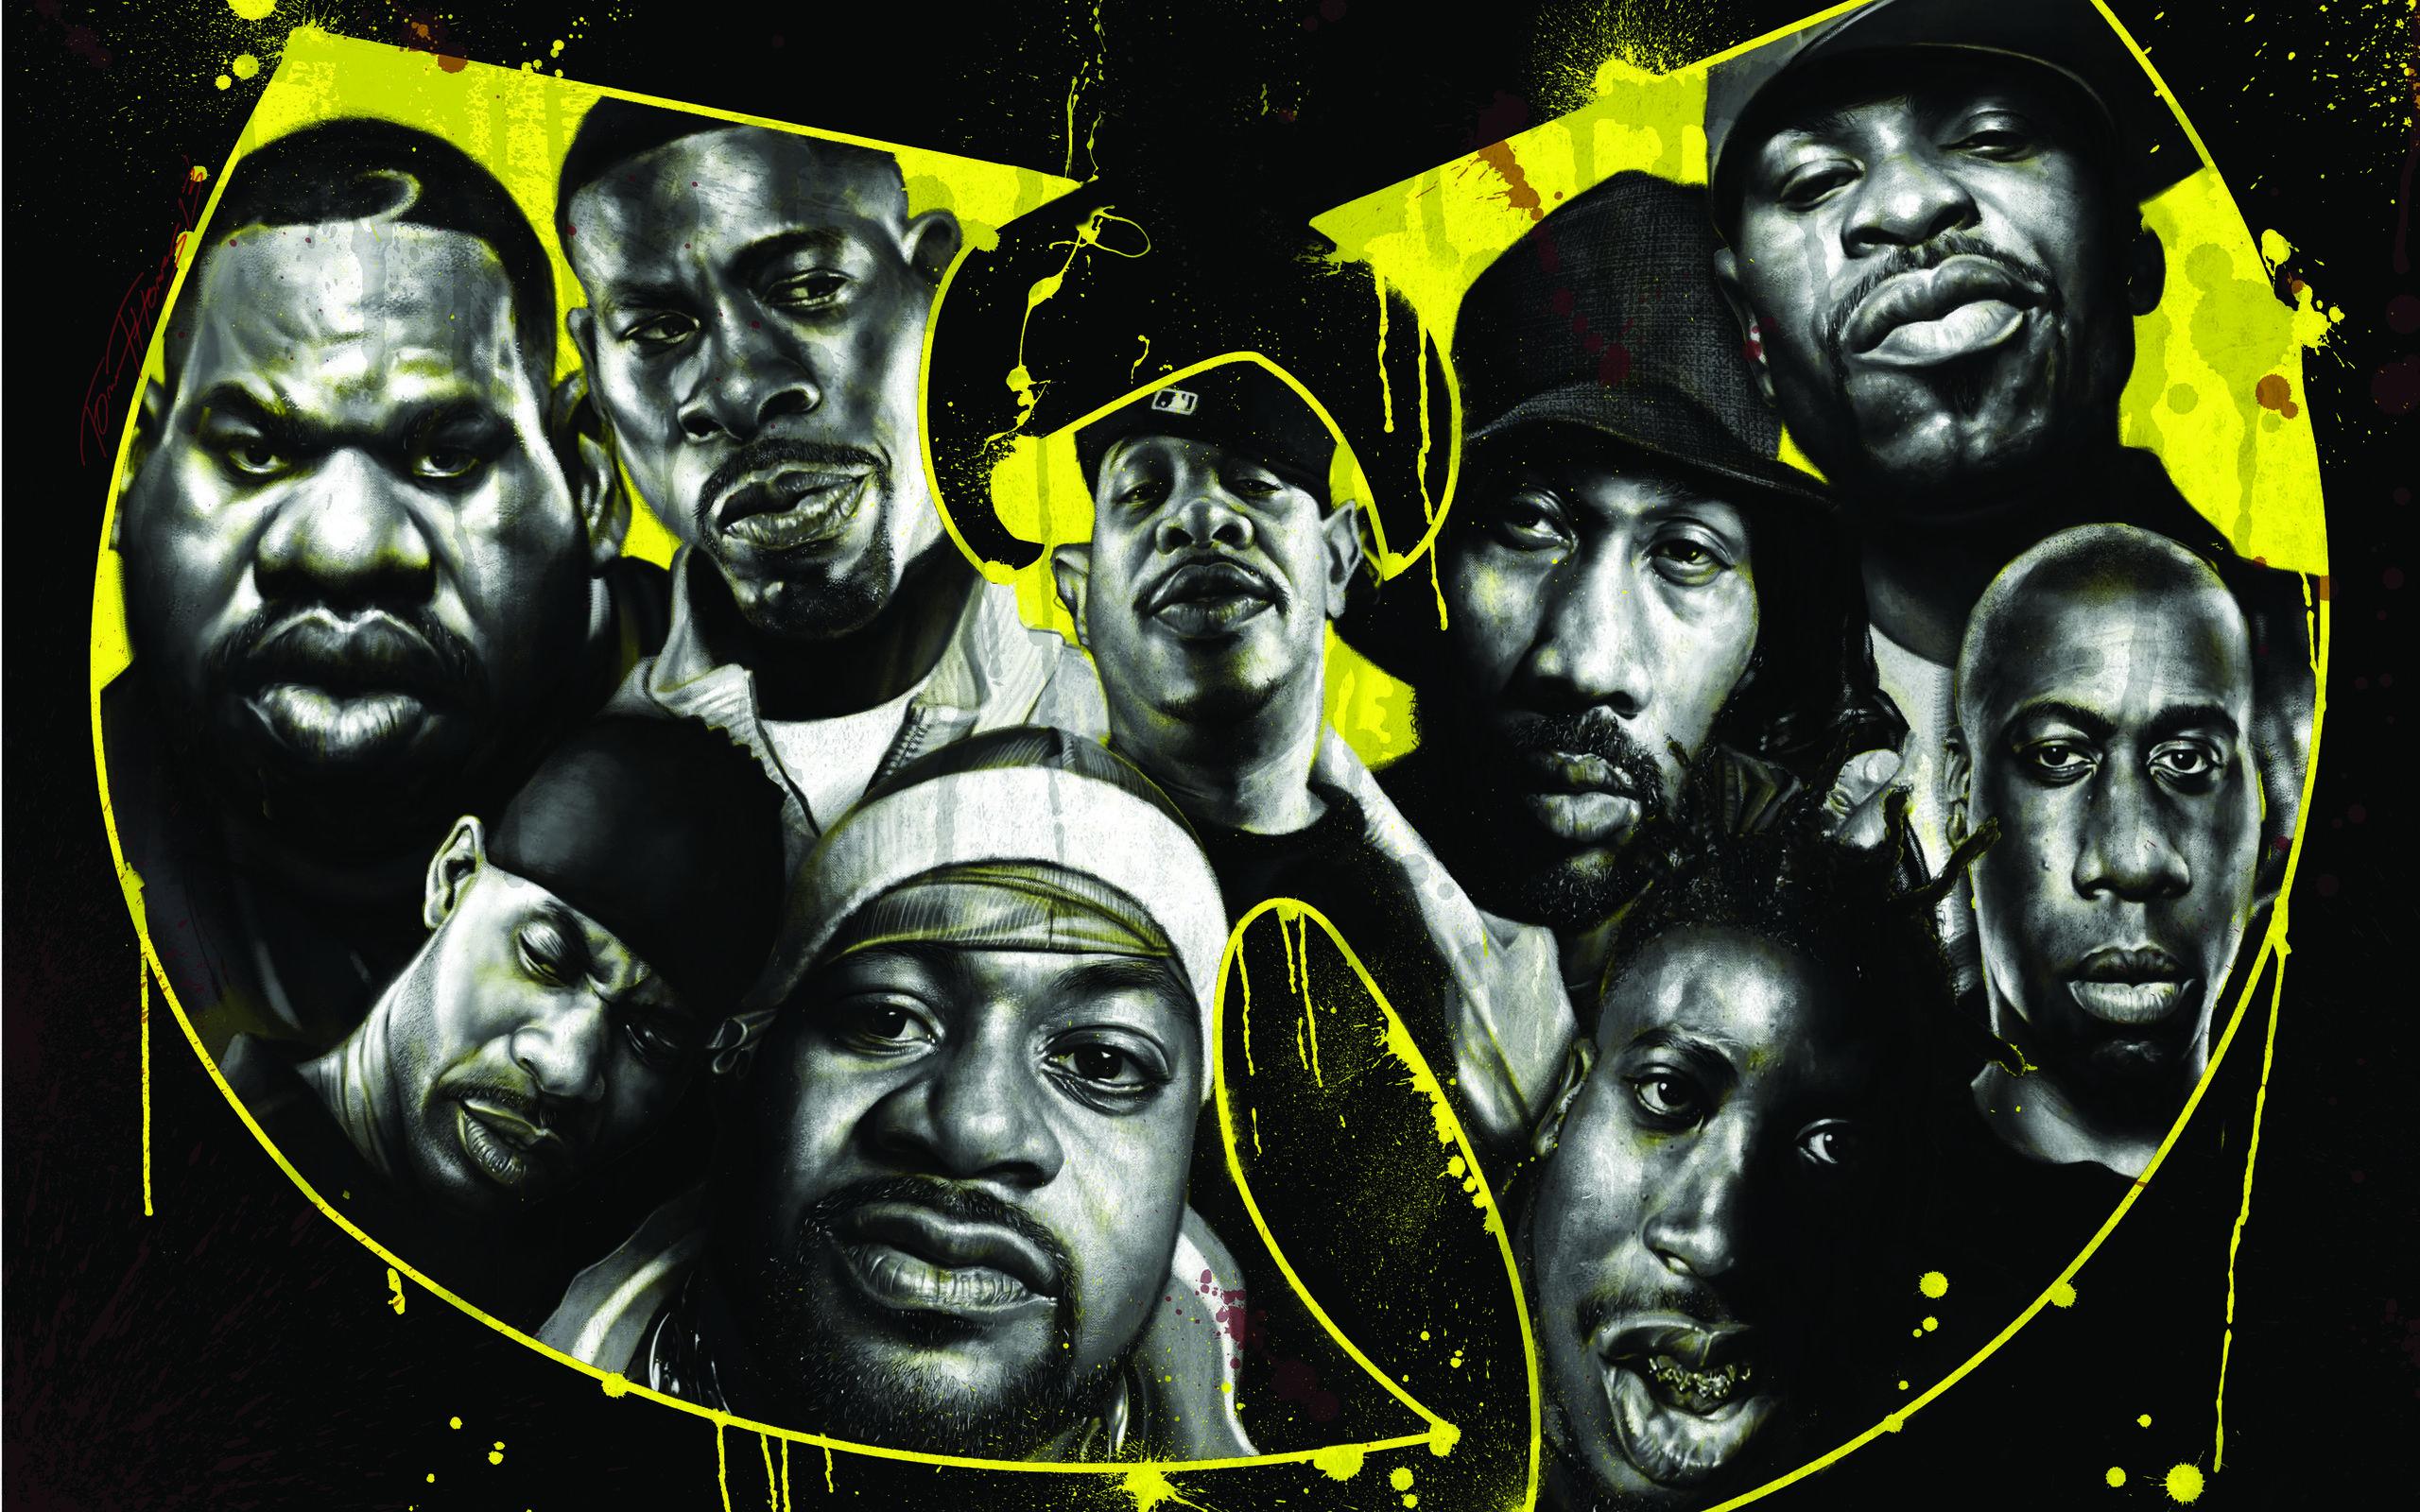 hip hop wallpapers 2017 - photo #21